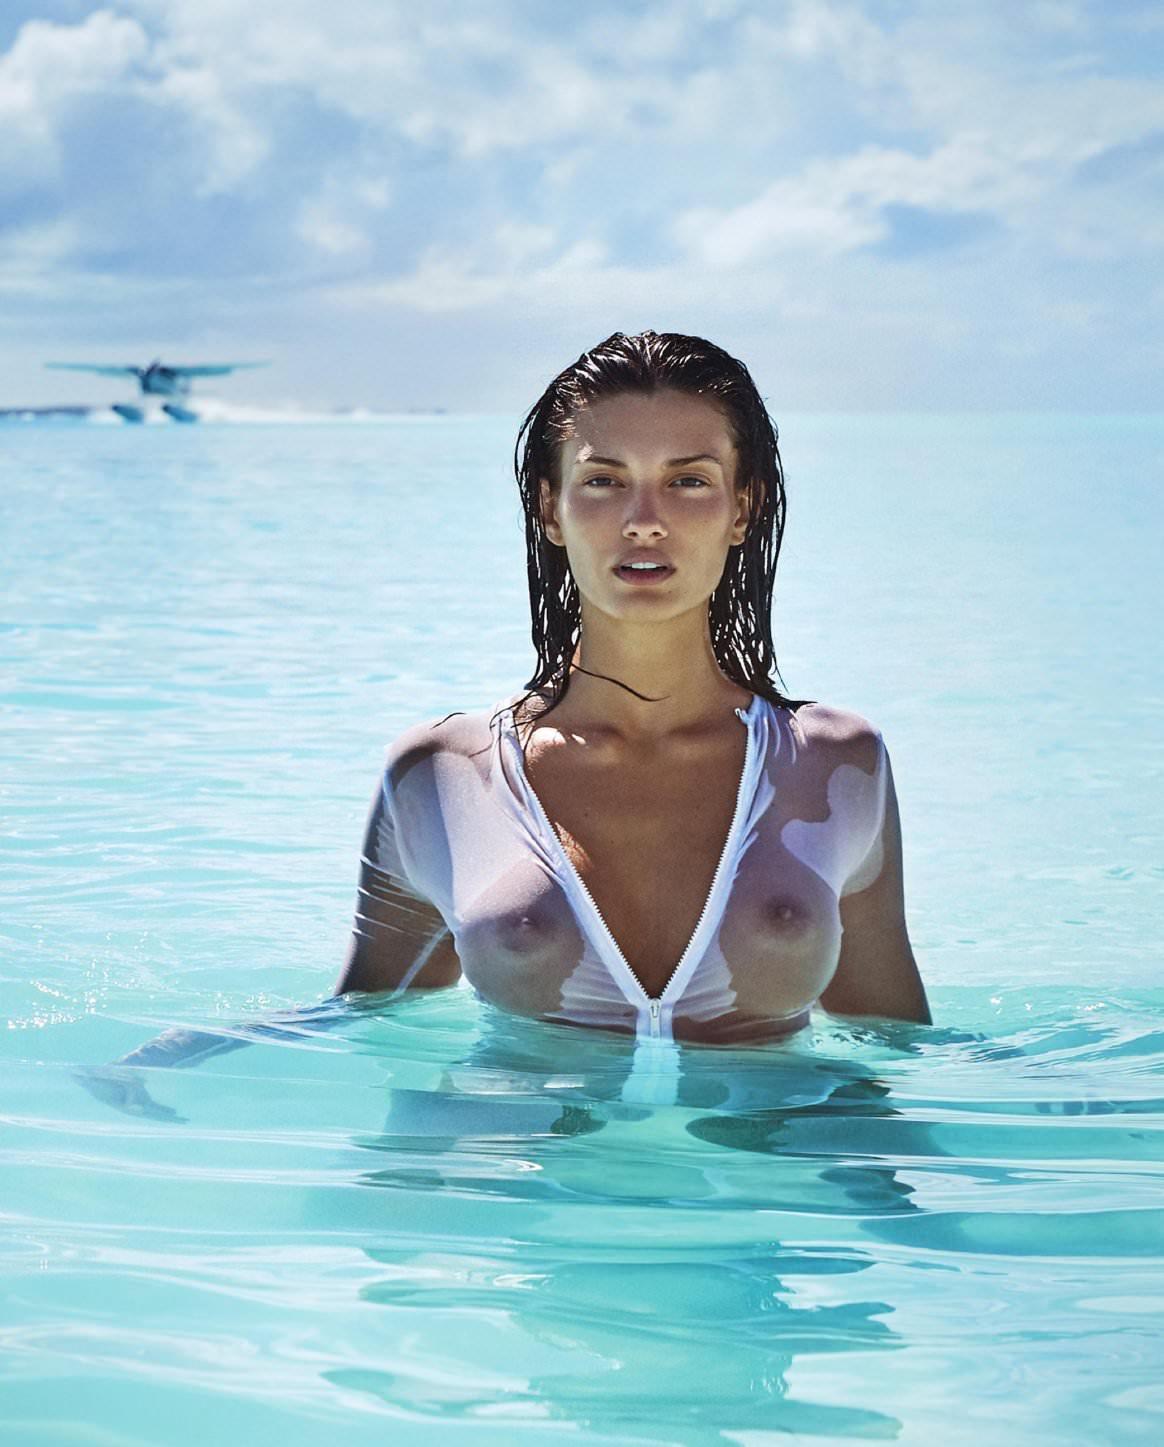 Erotica Dana Taylor nude photos 2019